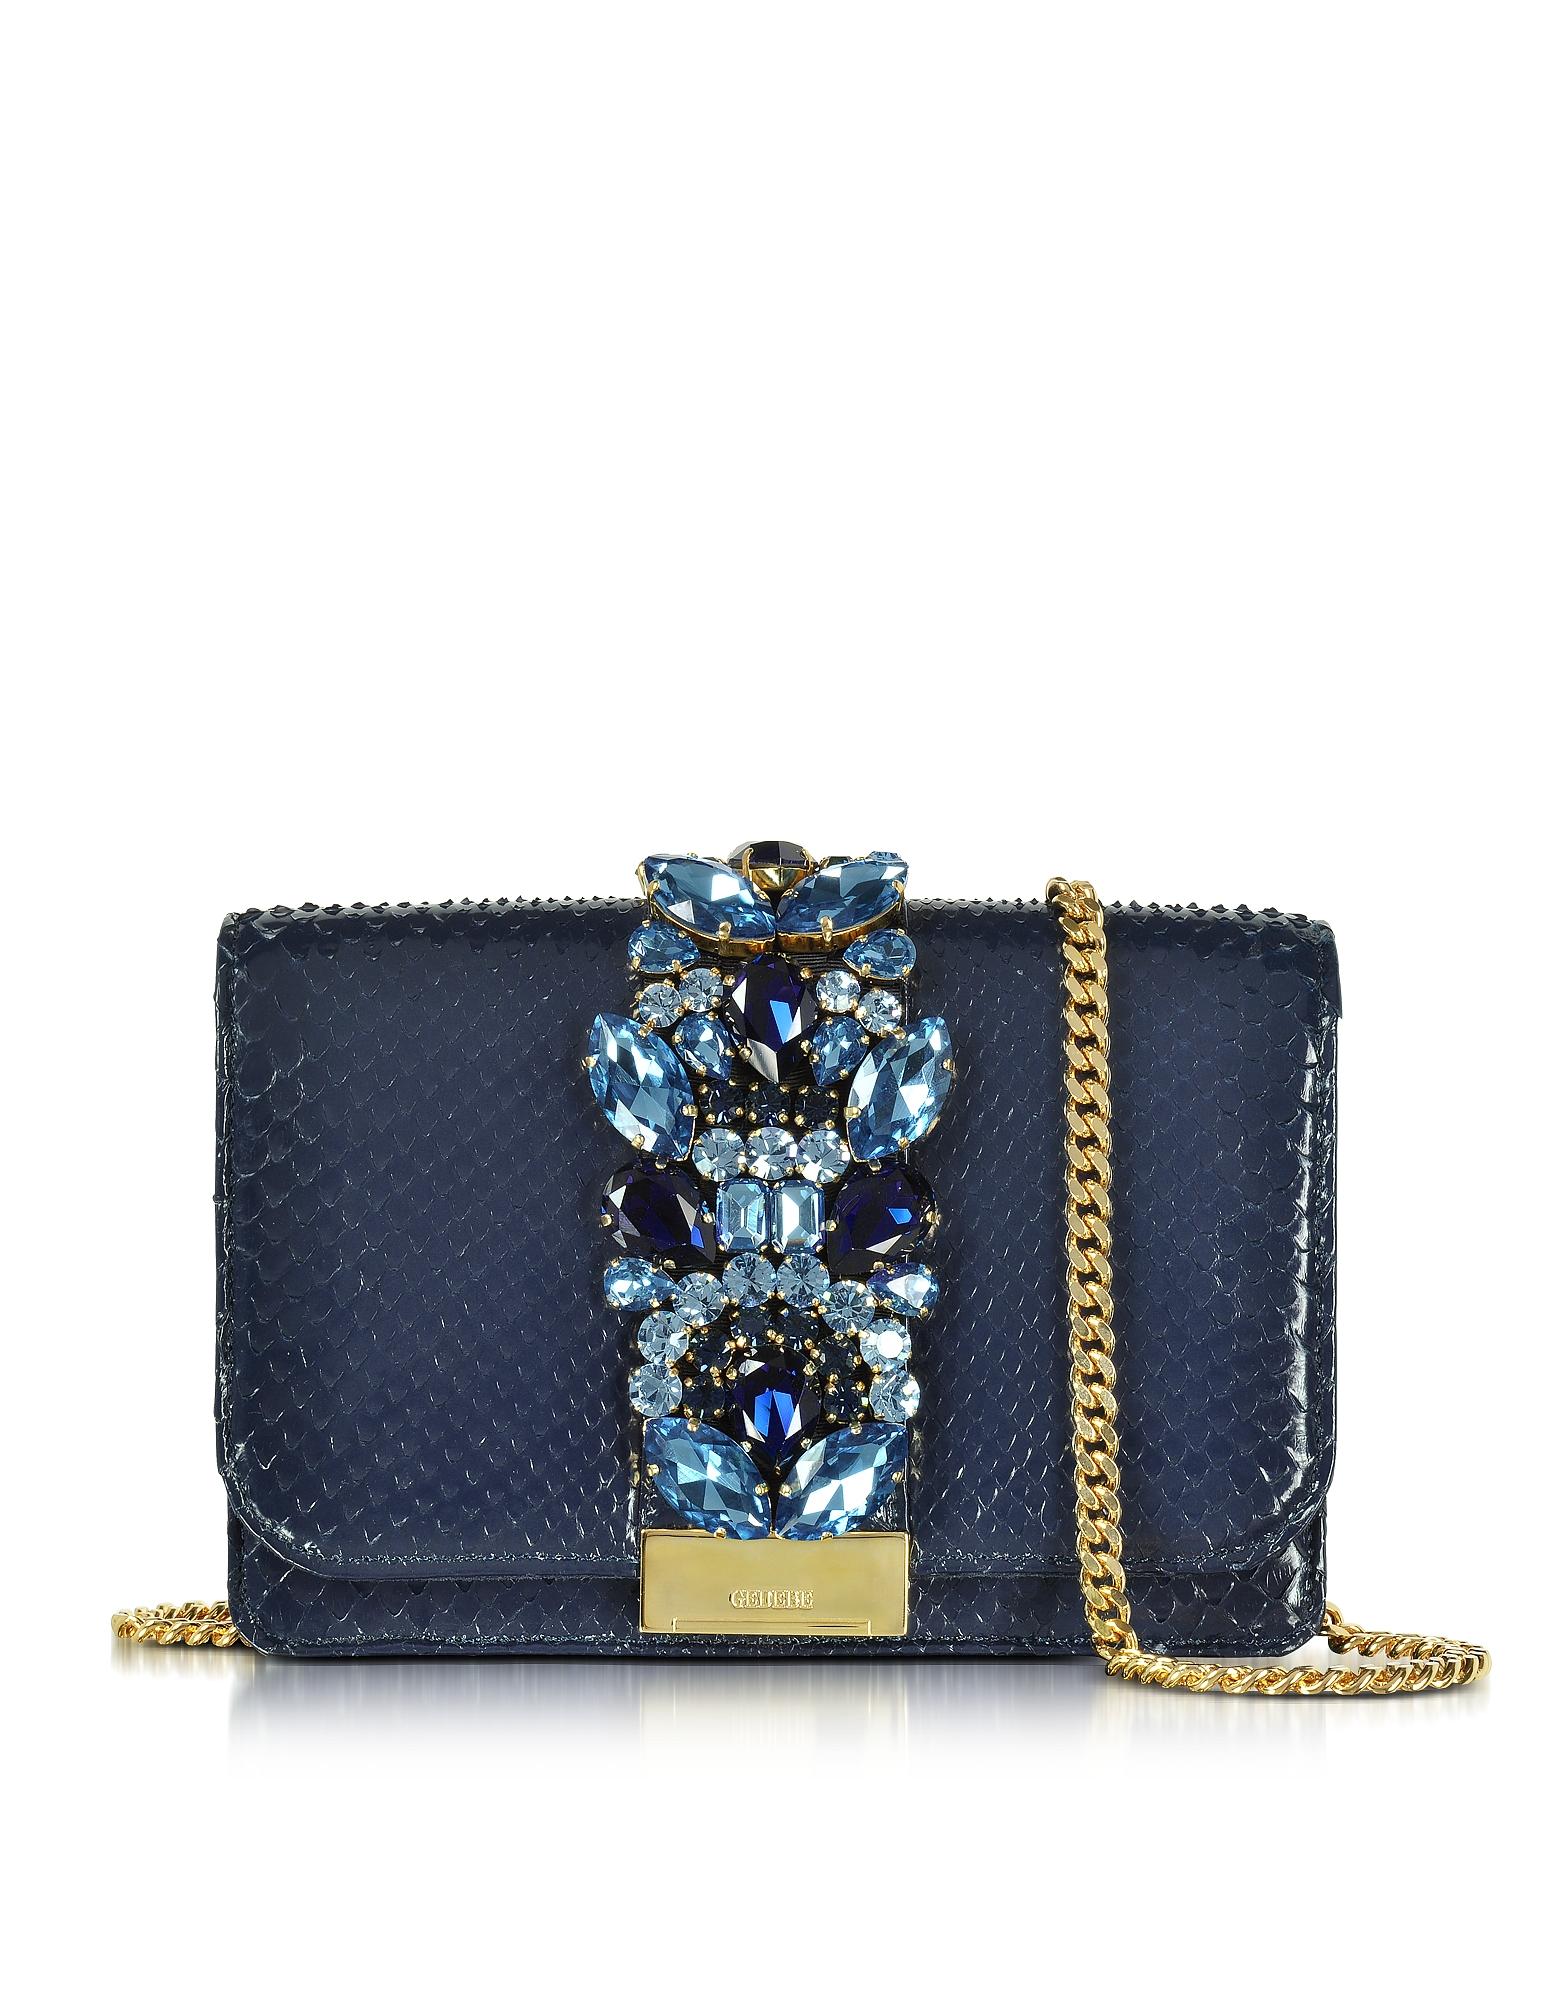 Gedebe Handbags, Clicky Midnight Blue Python Clutch w/Crystals